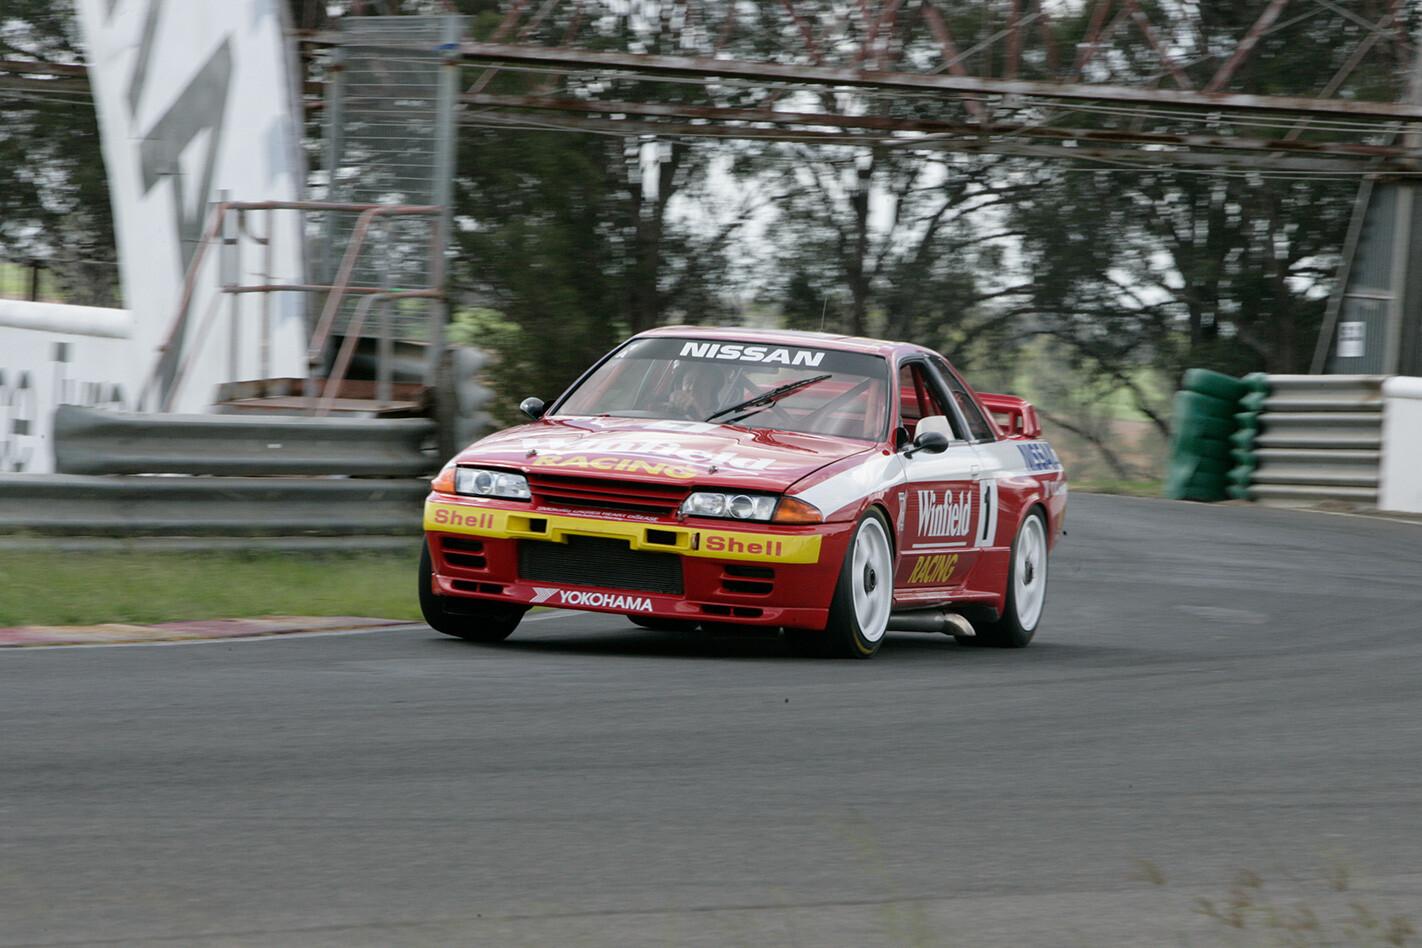 Nissan Gtr Gibson Motorsport On Track Jpg